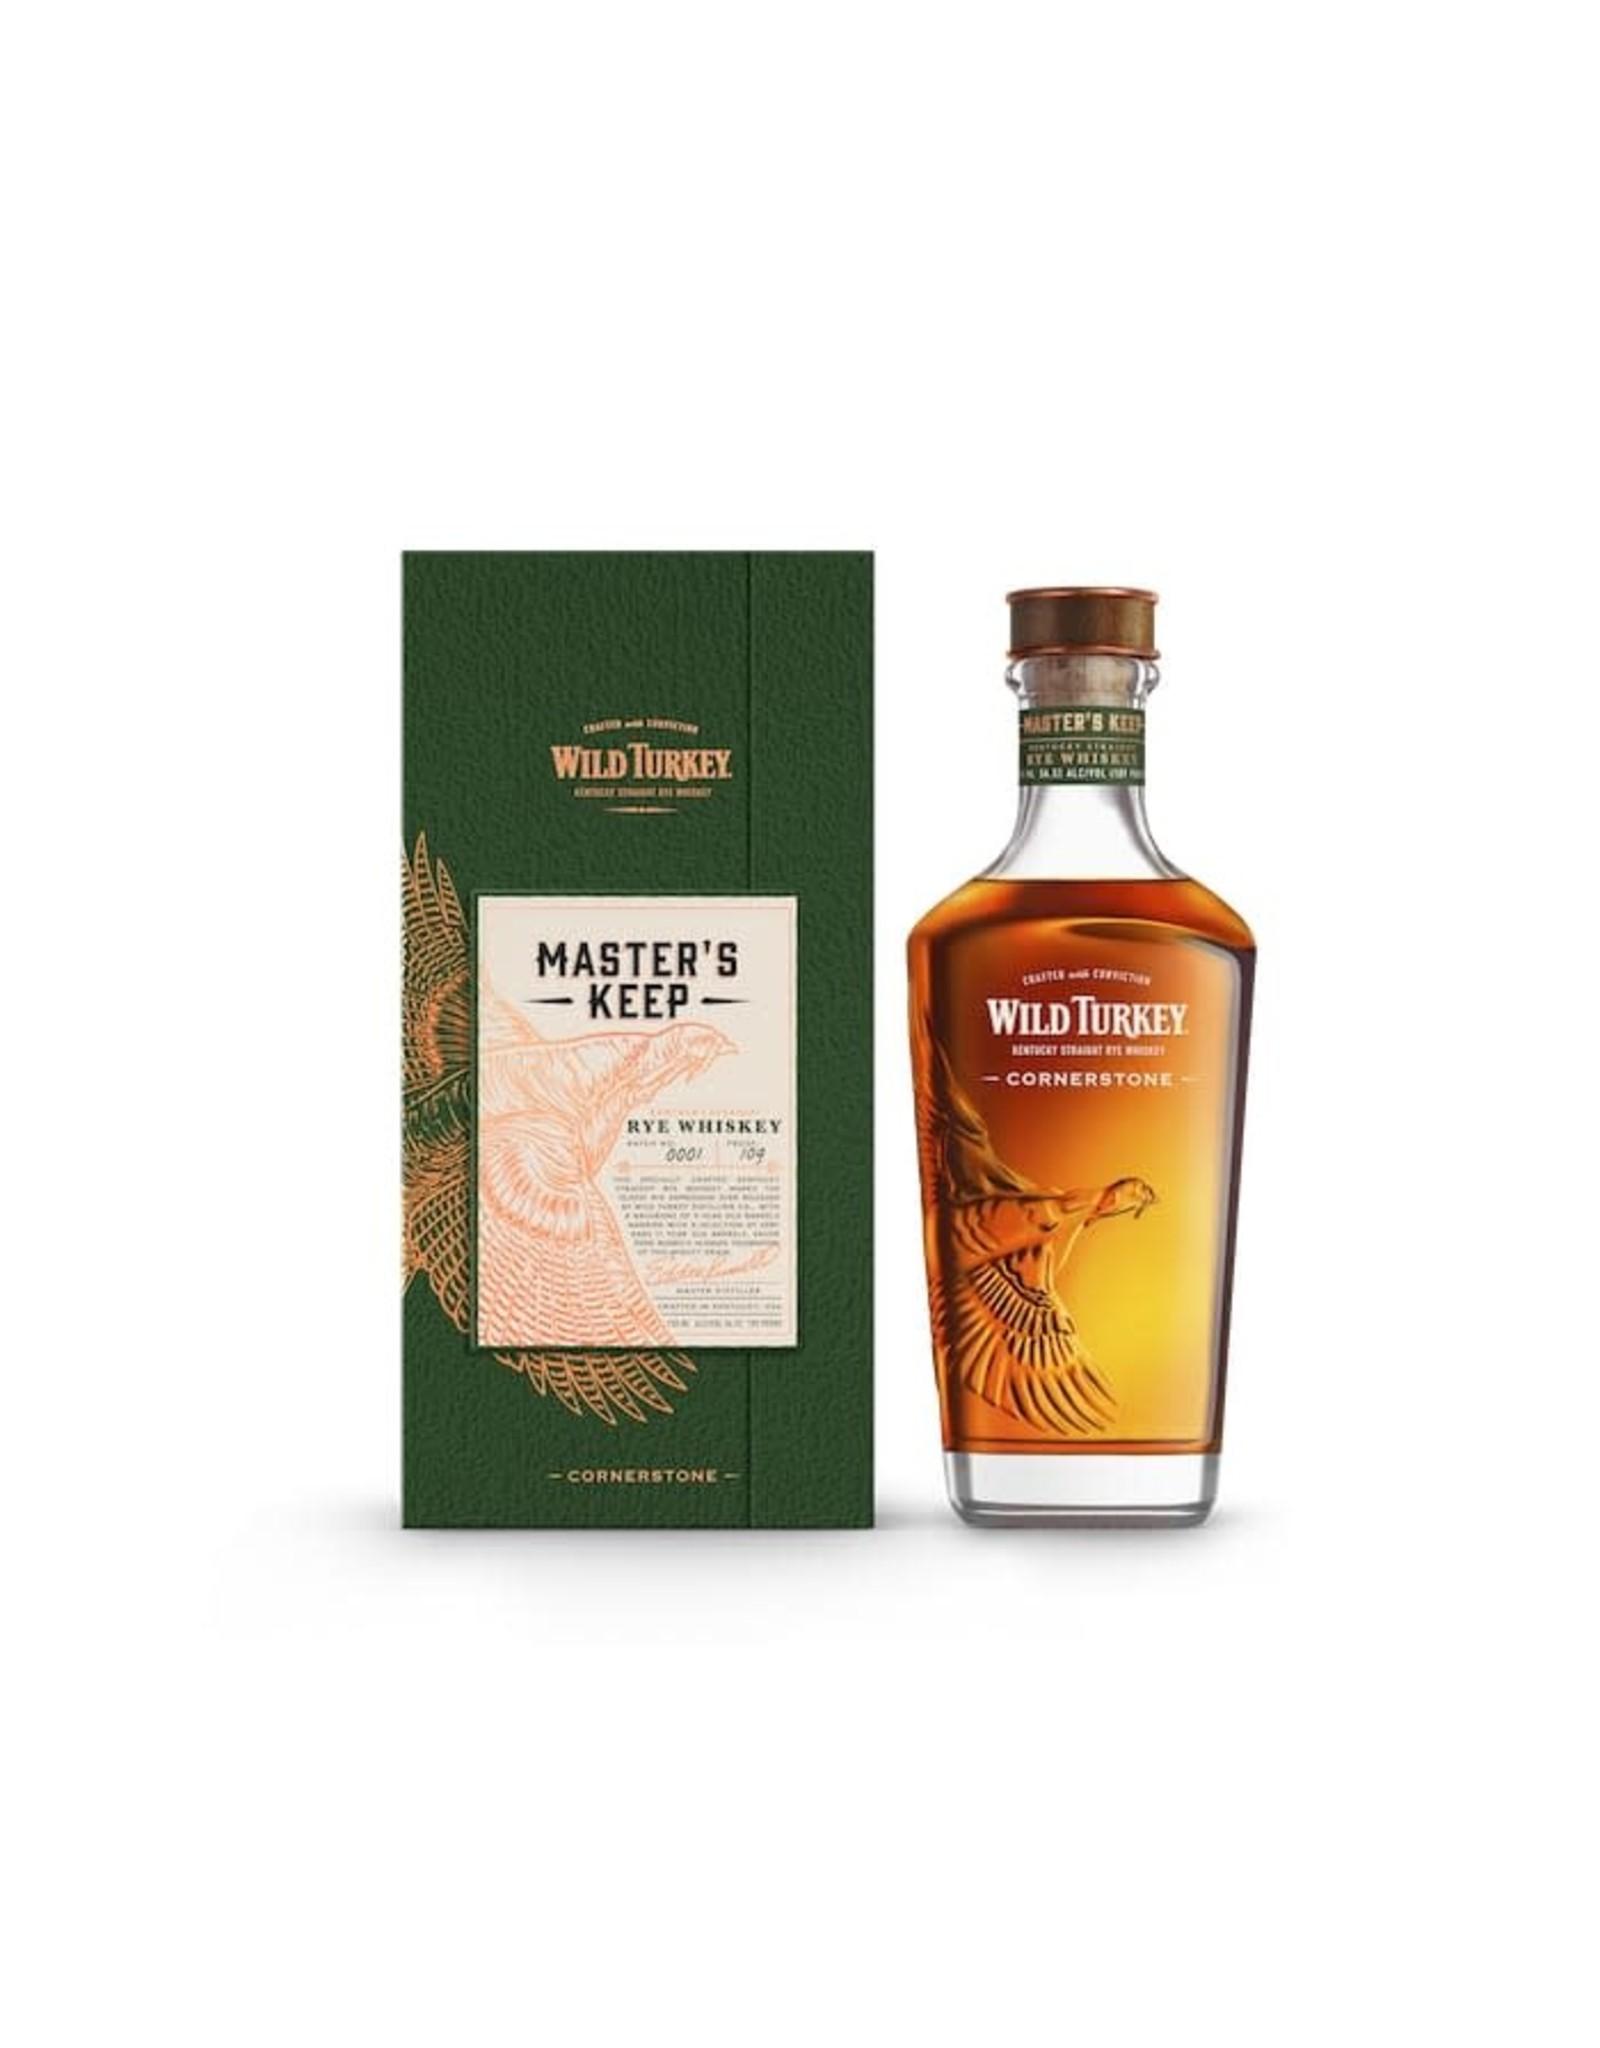 WILD TURKEY MASTERS KEEP CORNERSTON 750ML